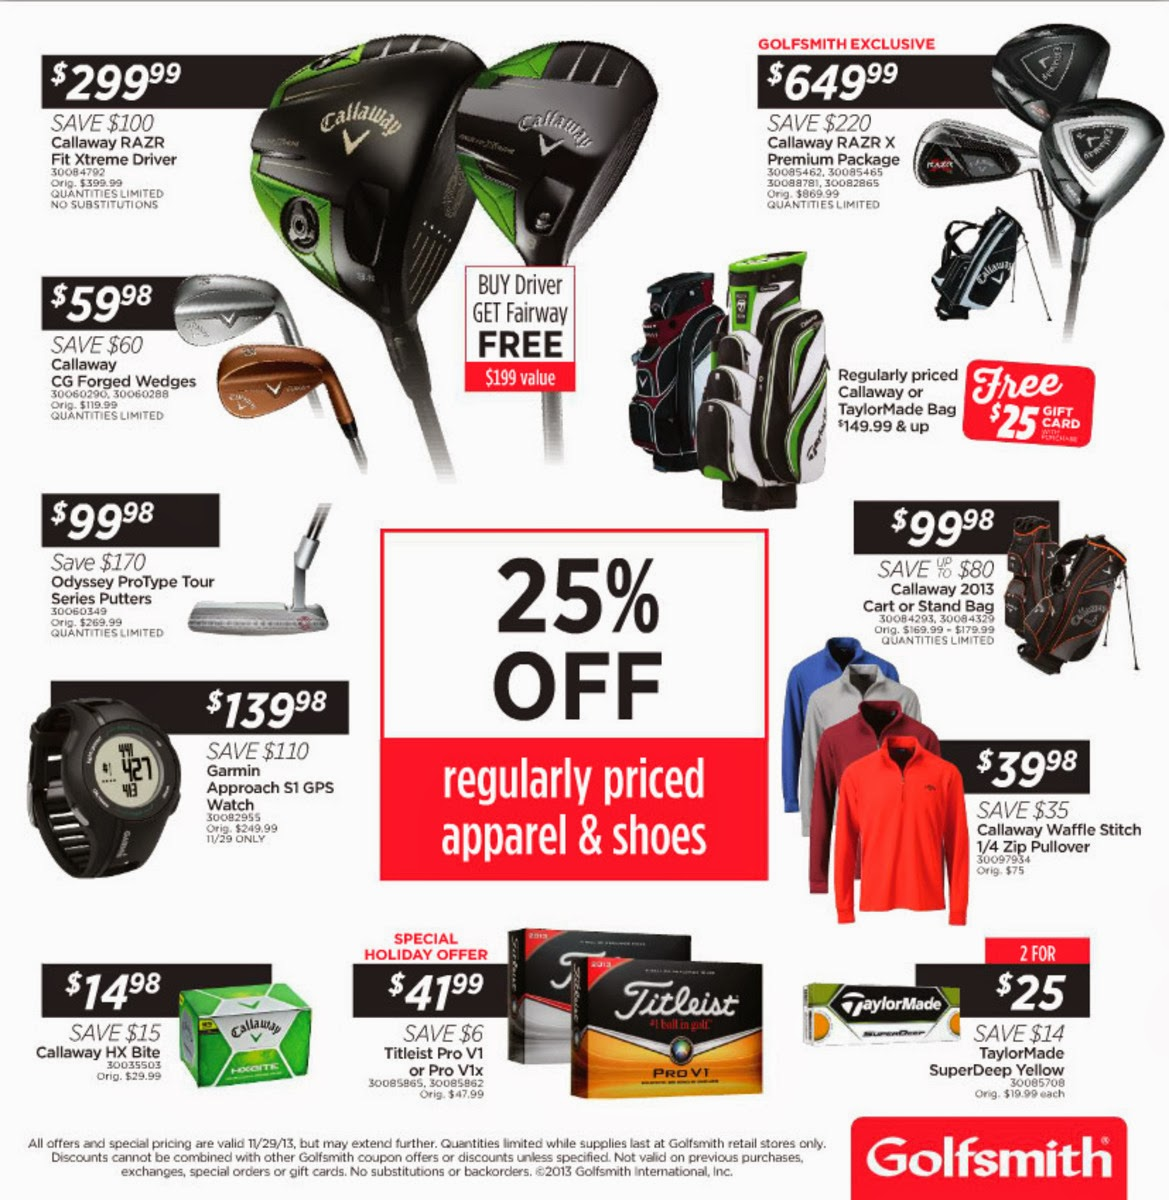 Golfsmith Black Friday Ad 2013   Black Friday Ads 2013